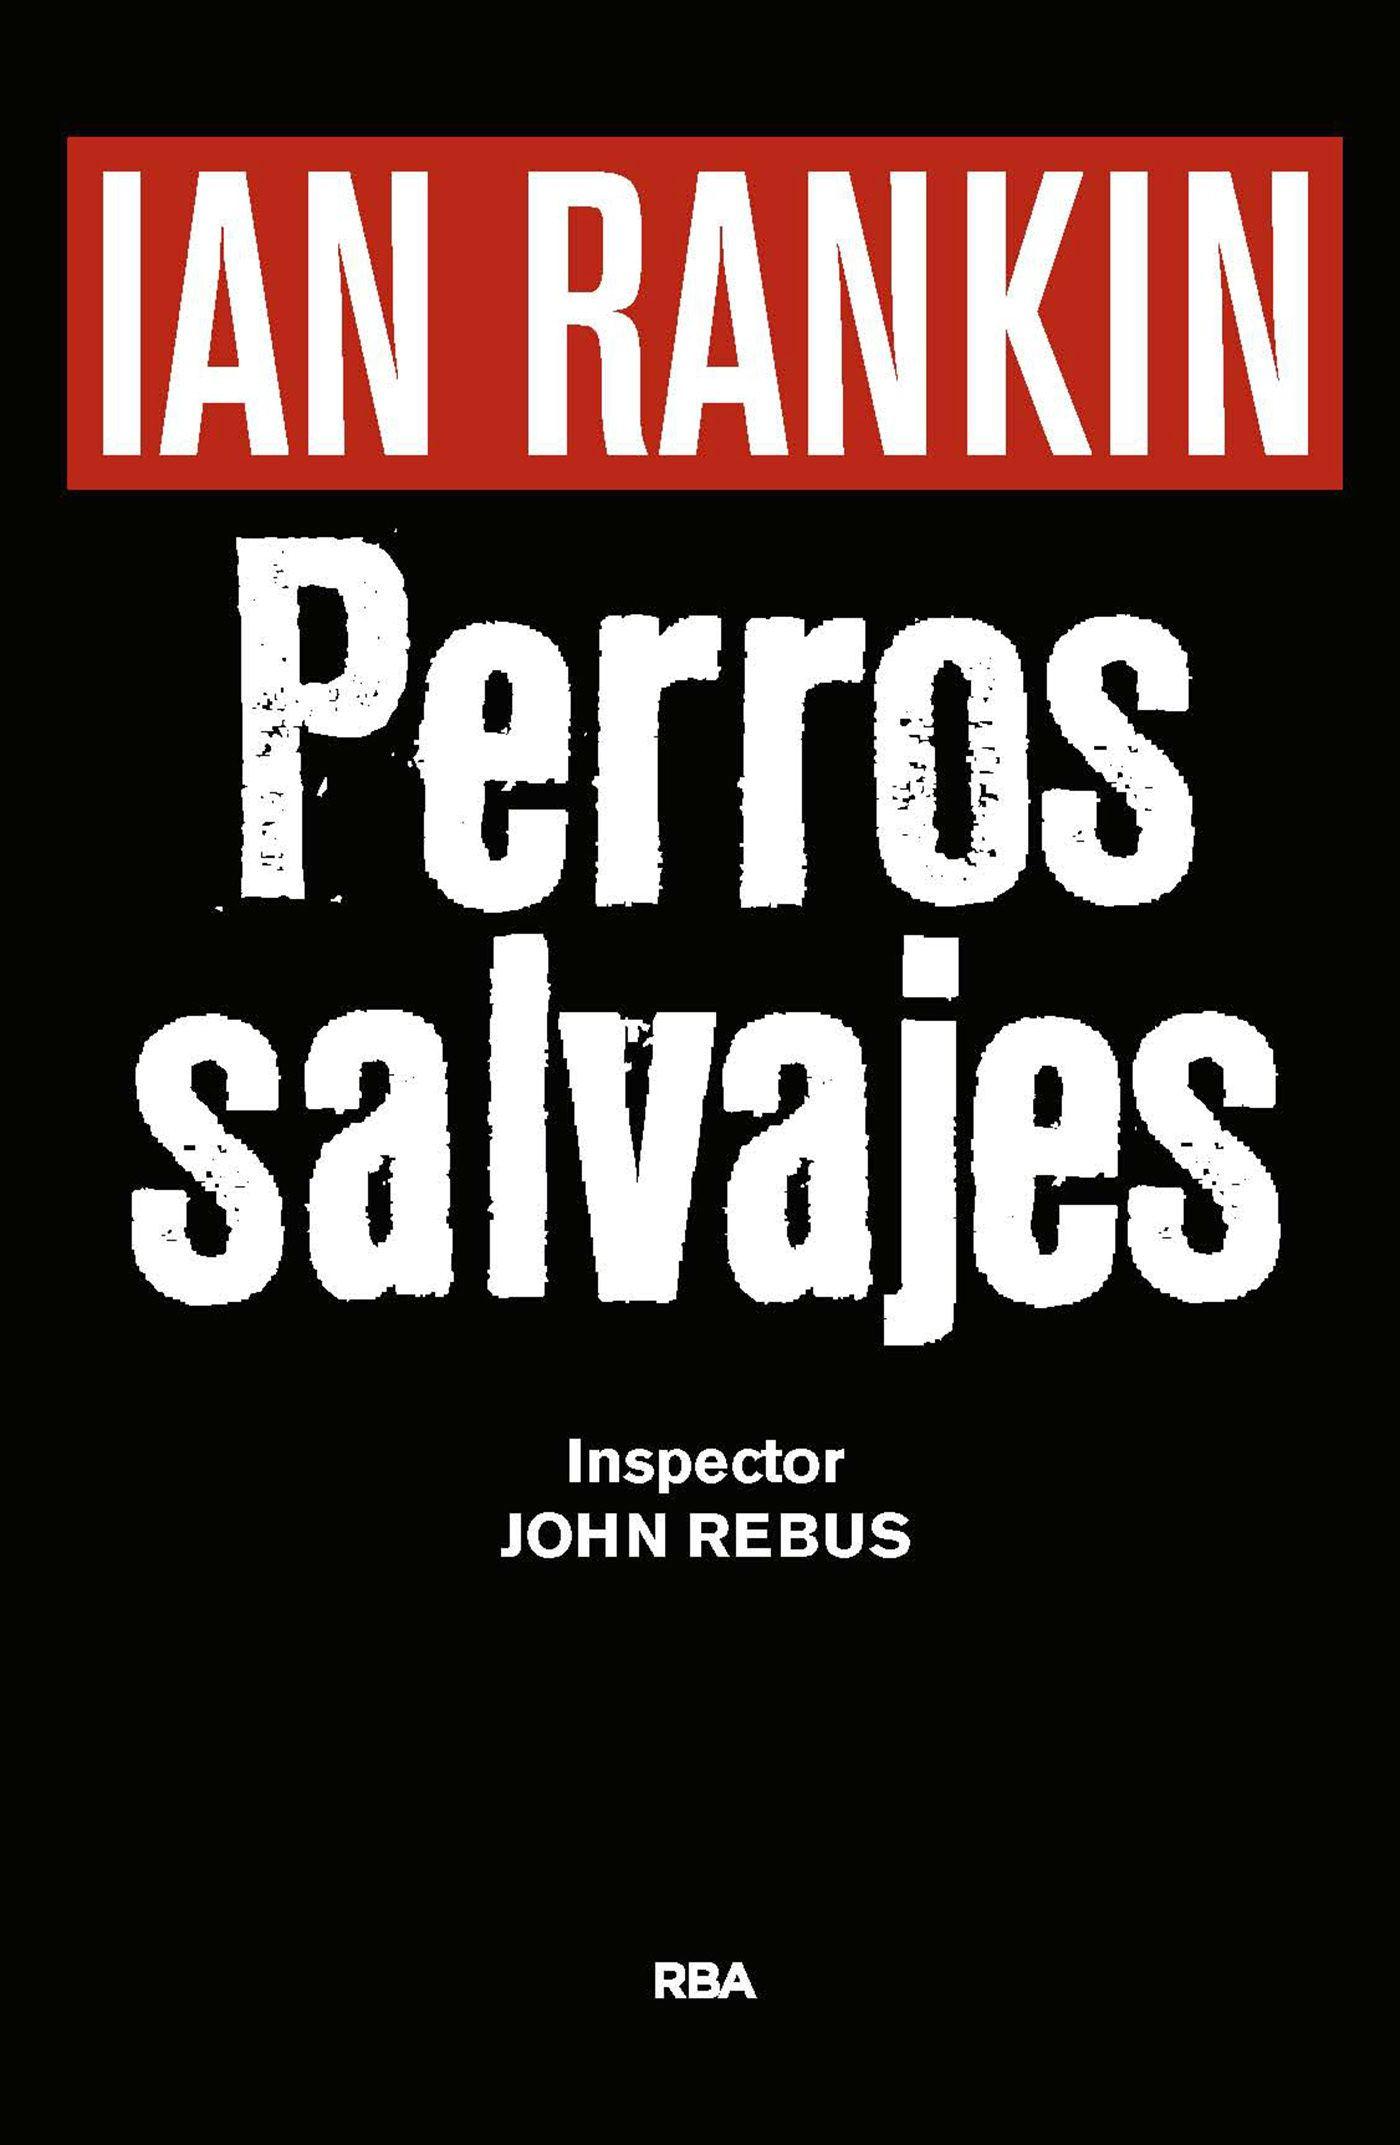 Perros Salvajes (Inspector John Rebus), de Ian Rankin. RBA. Novela Negra